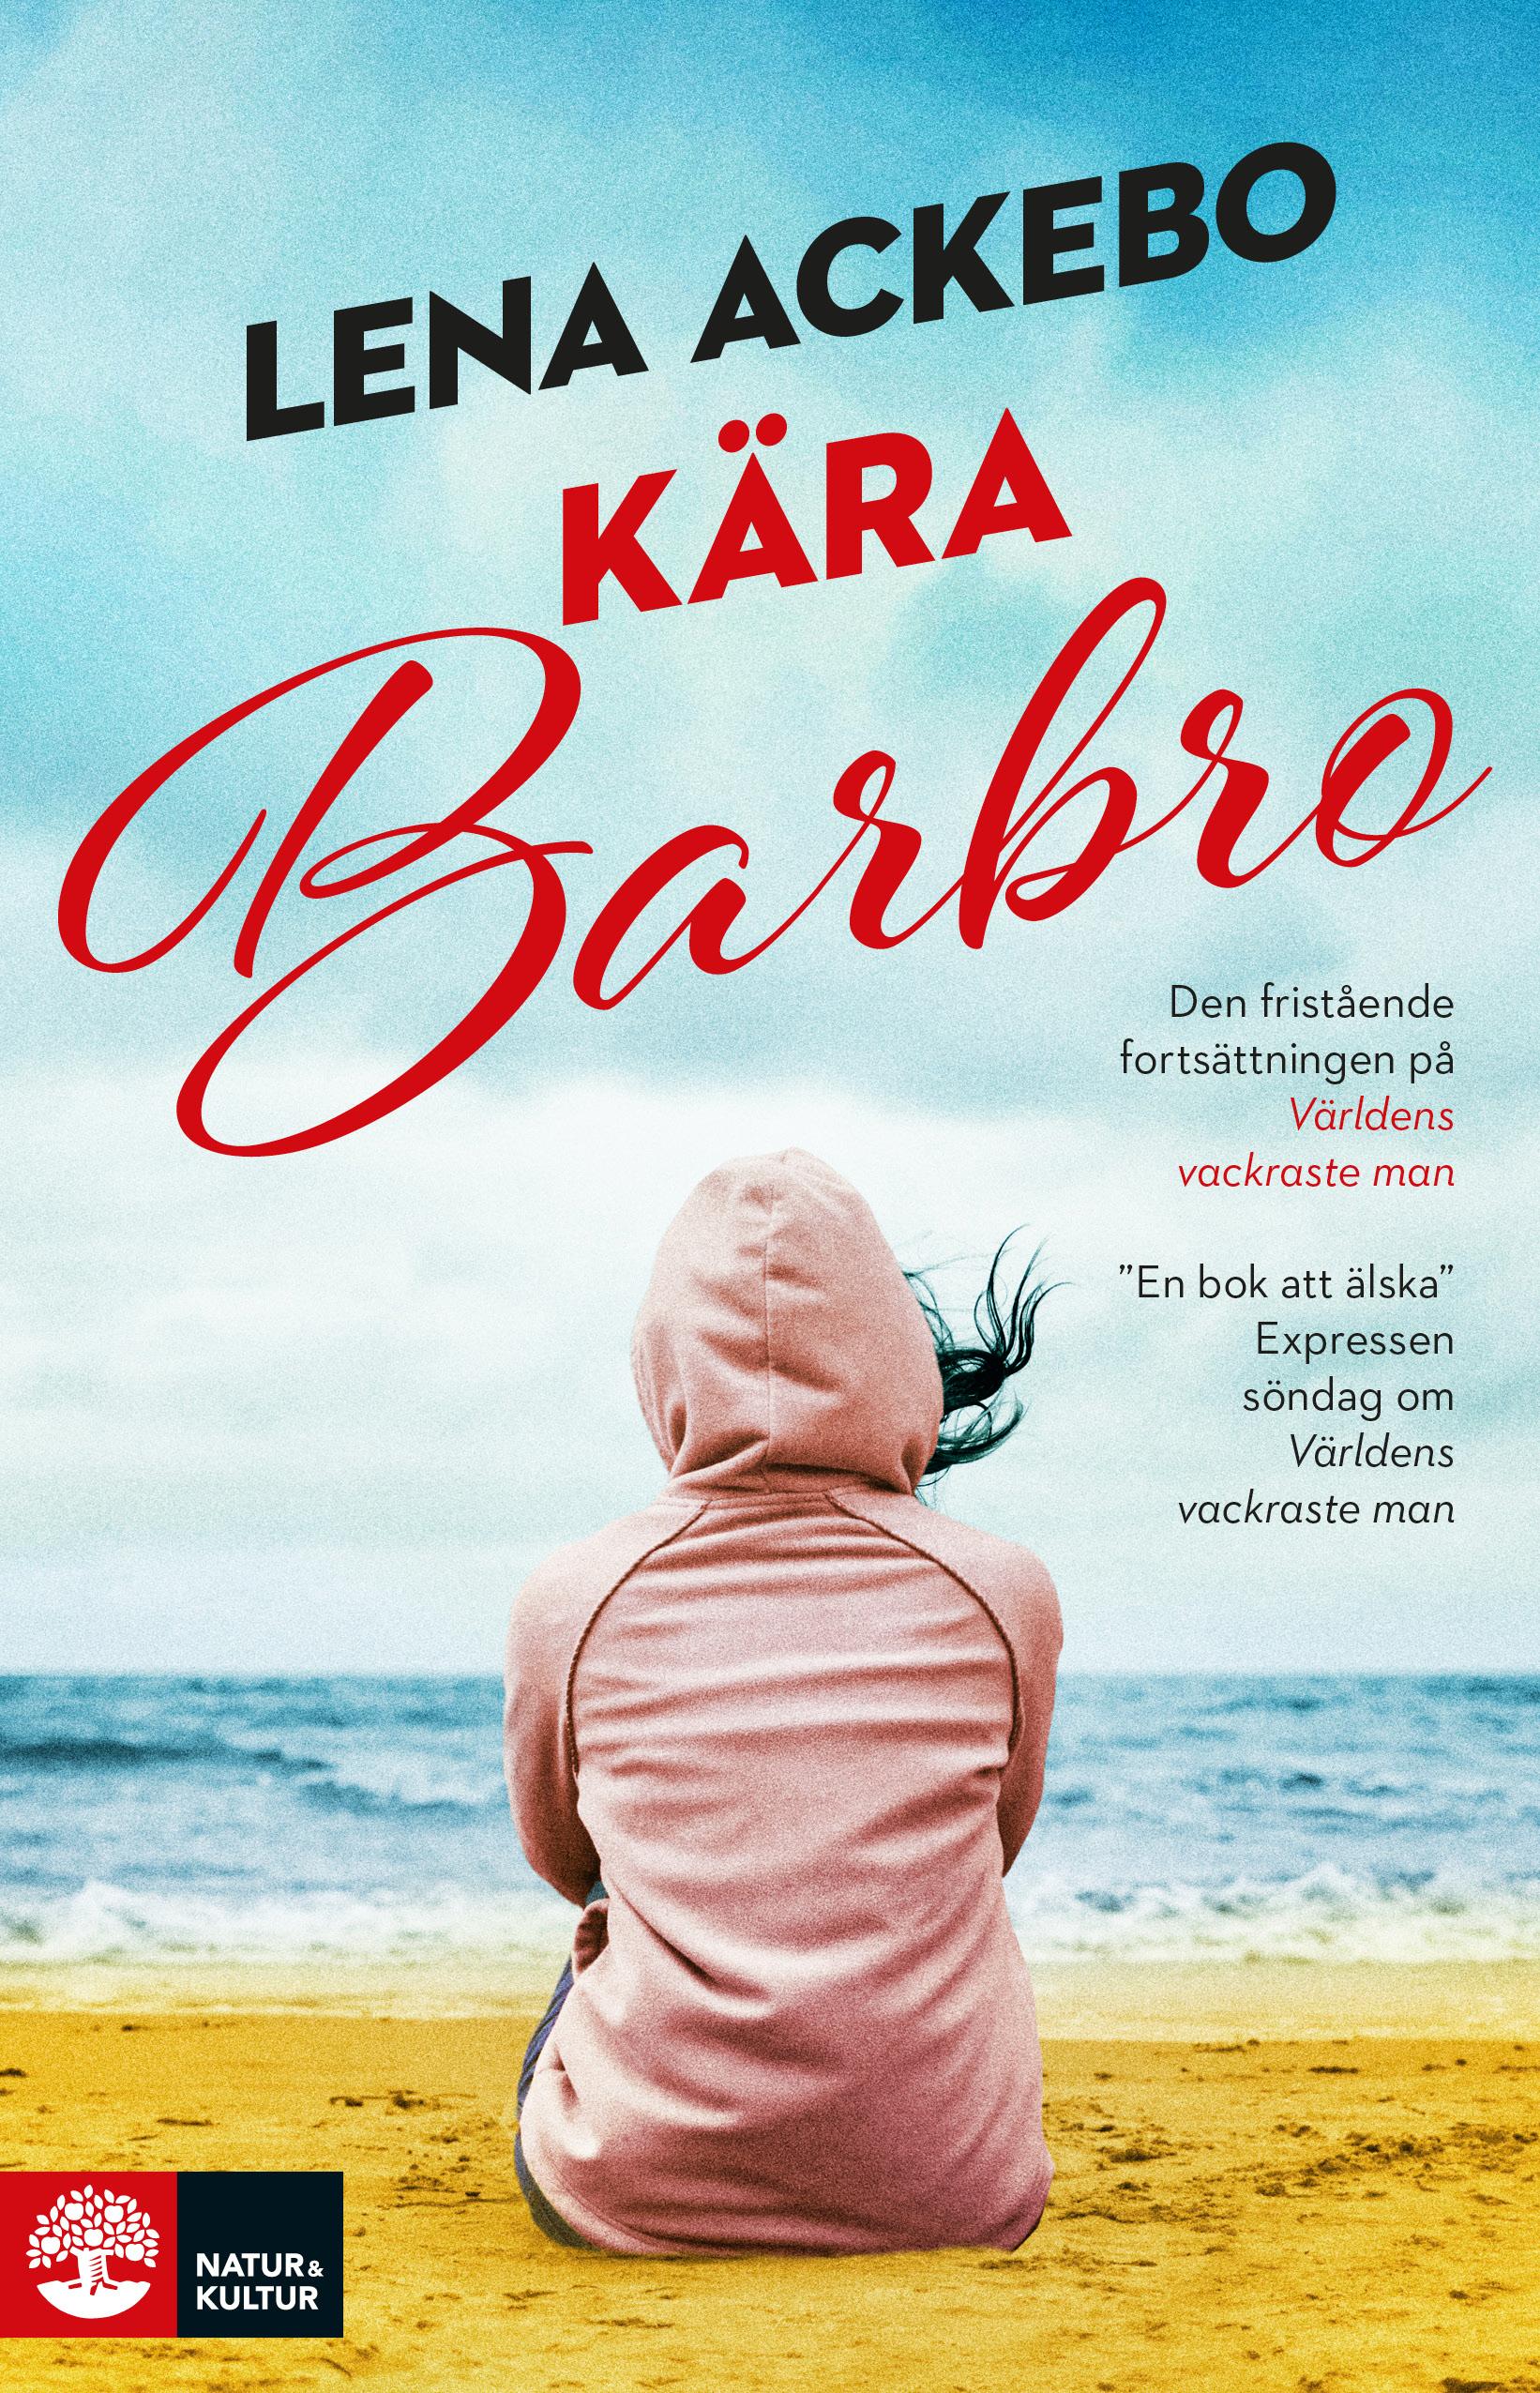 Dear Barbro